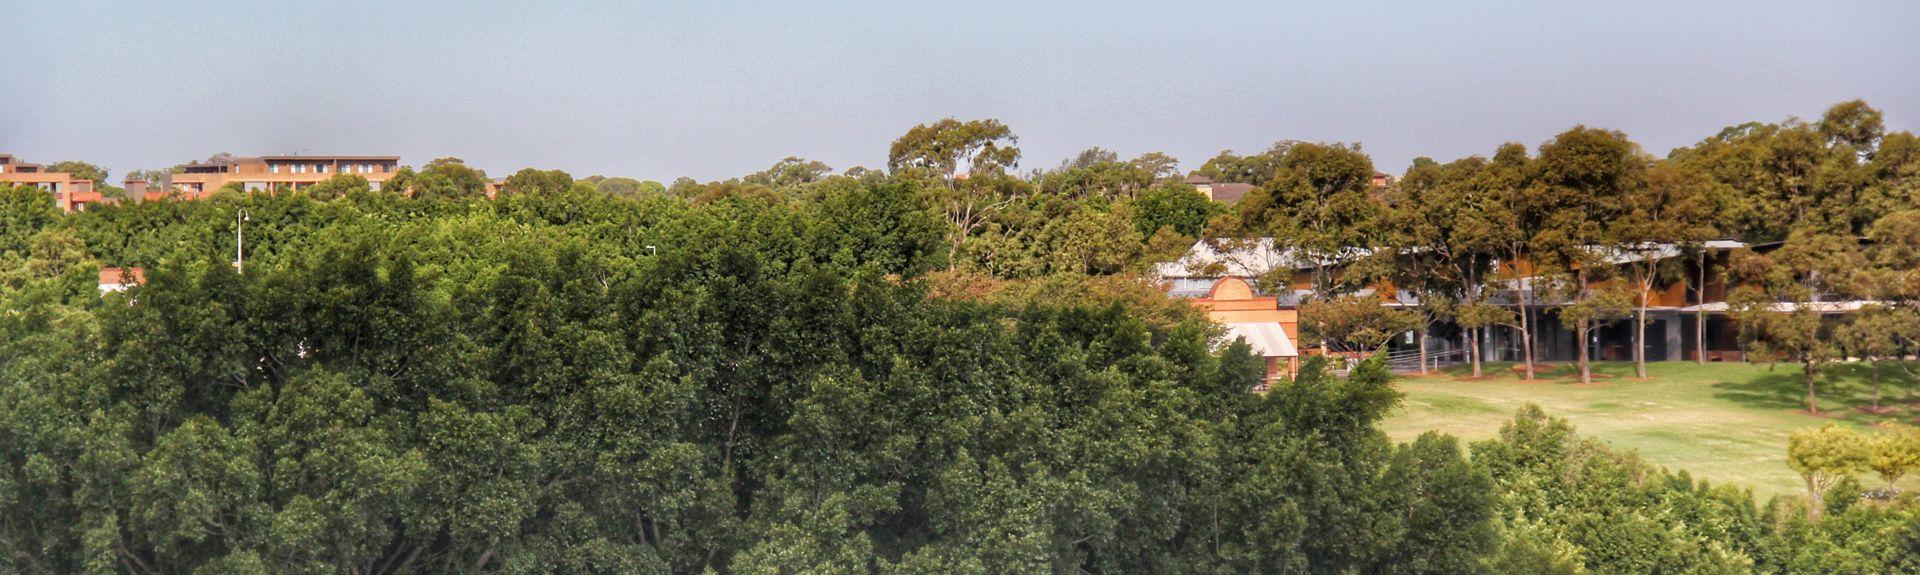 Cherrybrook, NSW, Australie